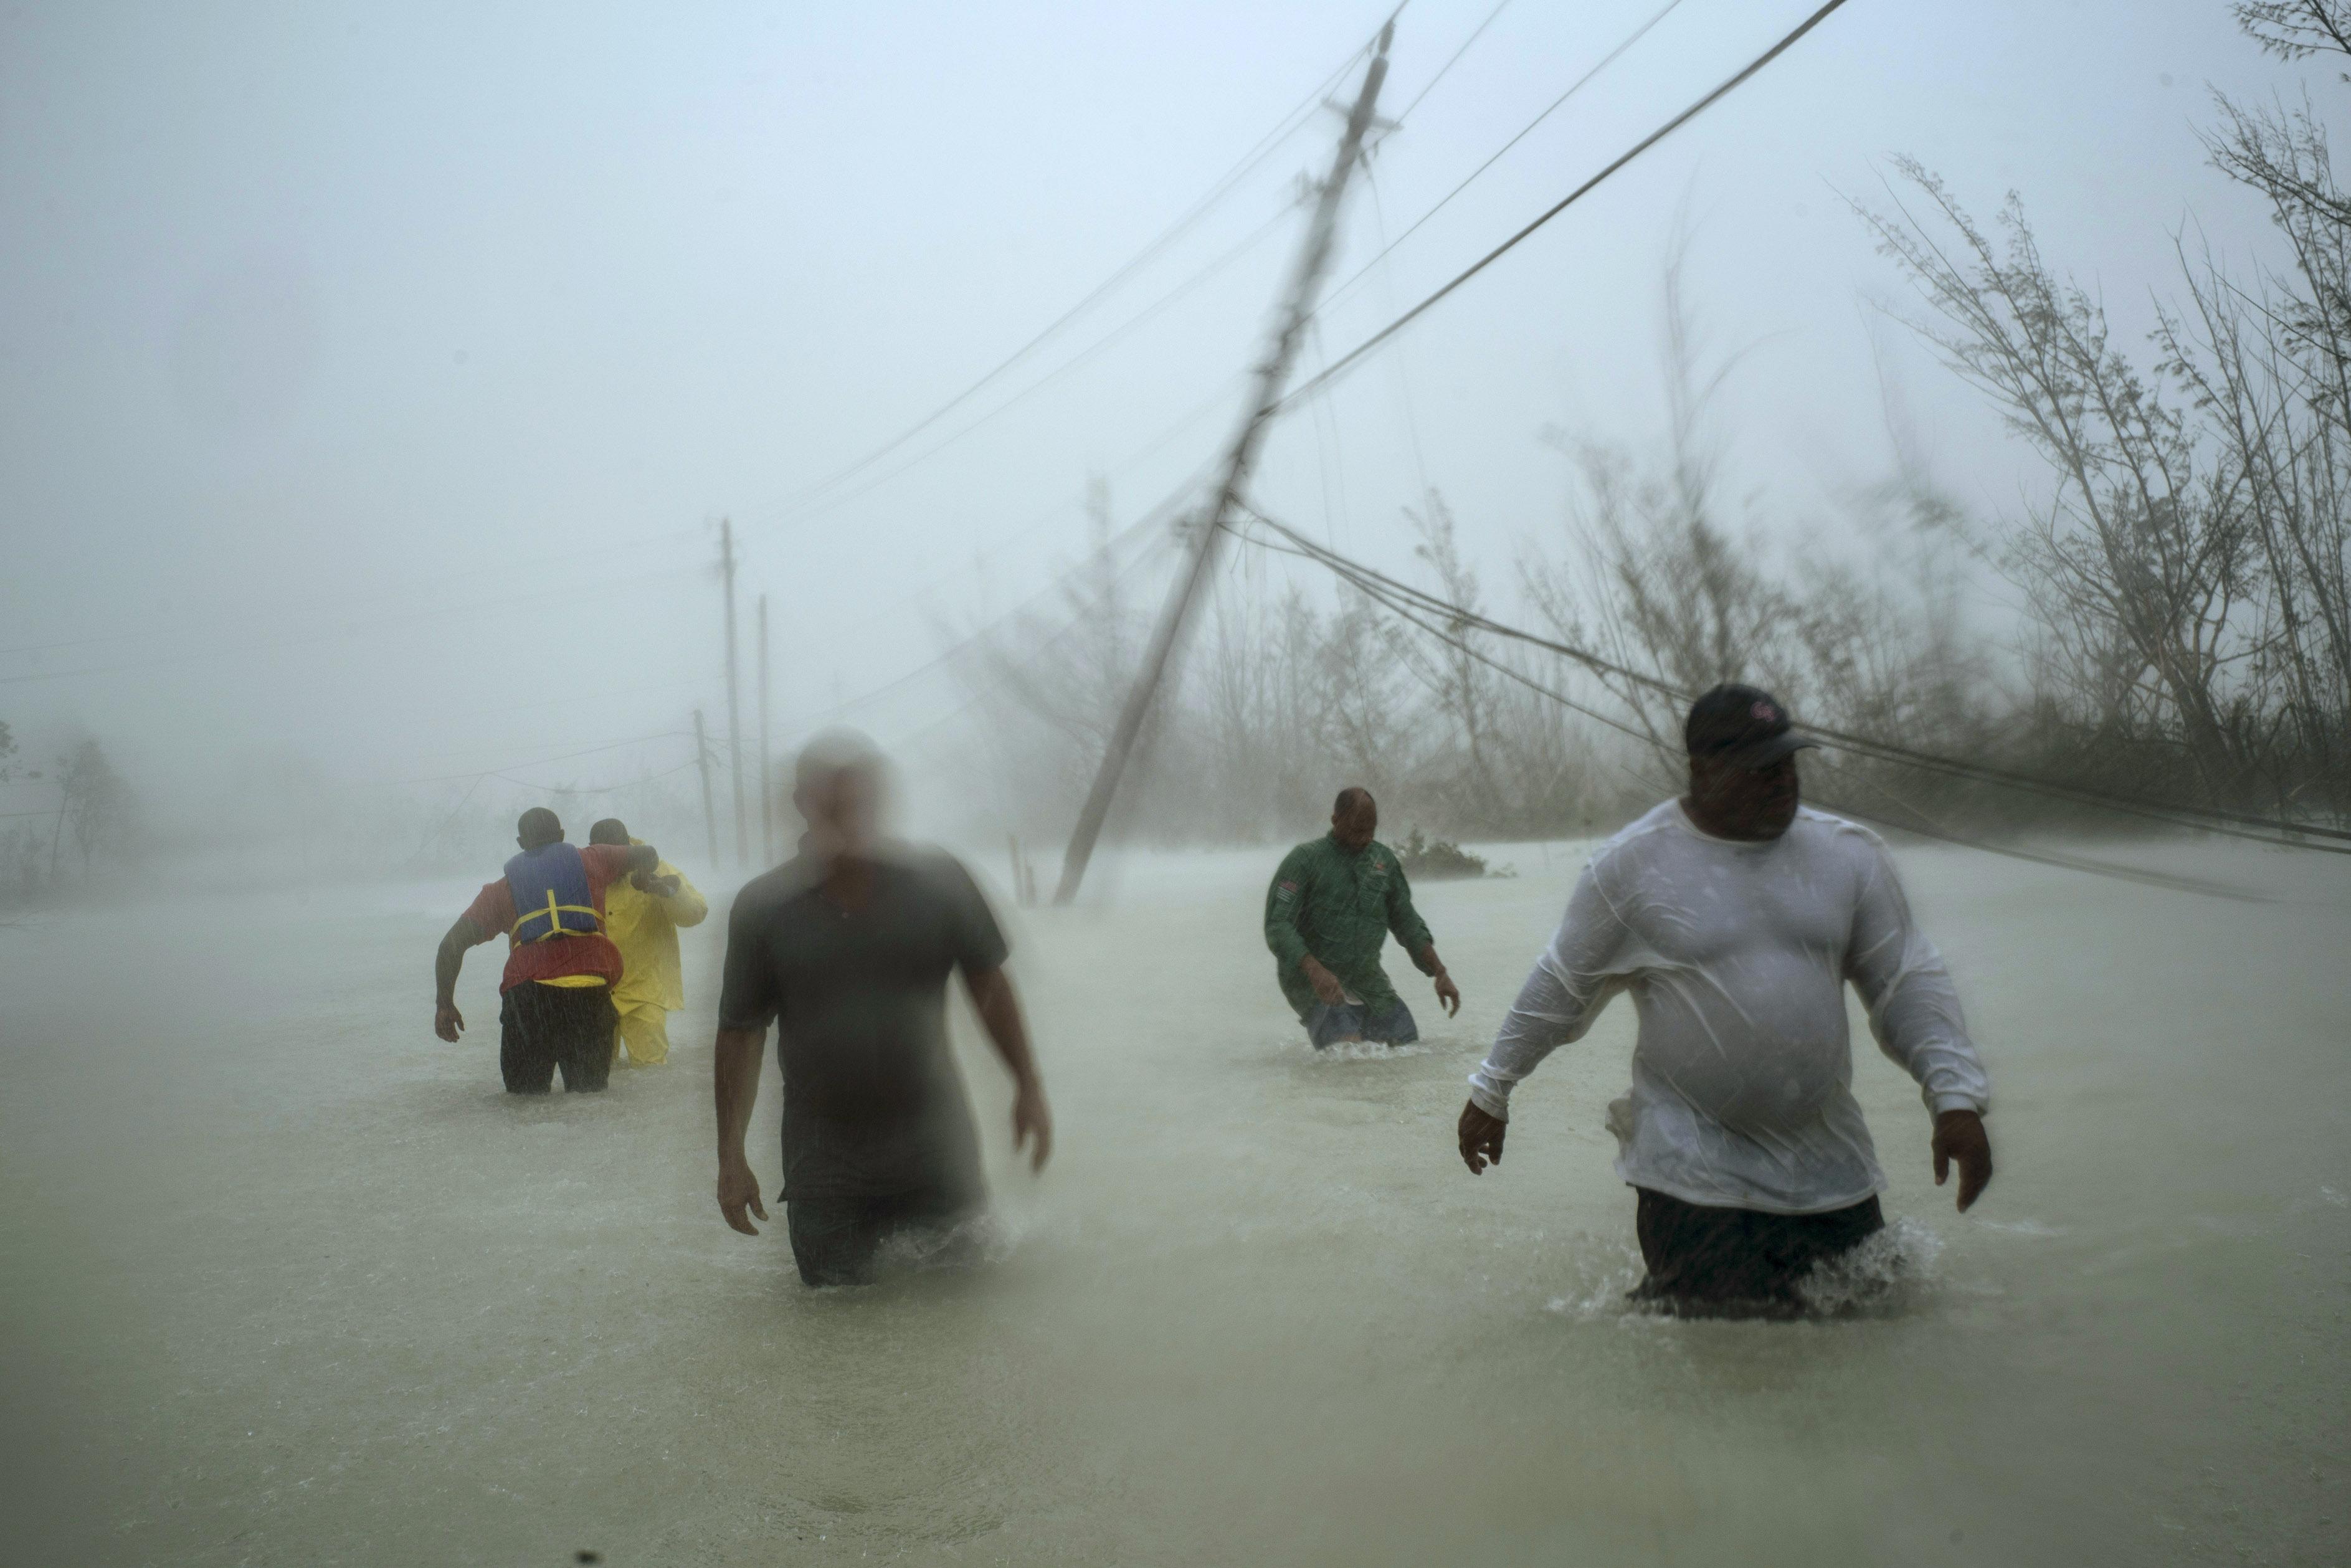 Total devastation: Hurricane slams parts of the Bahamas